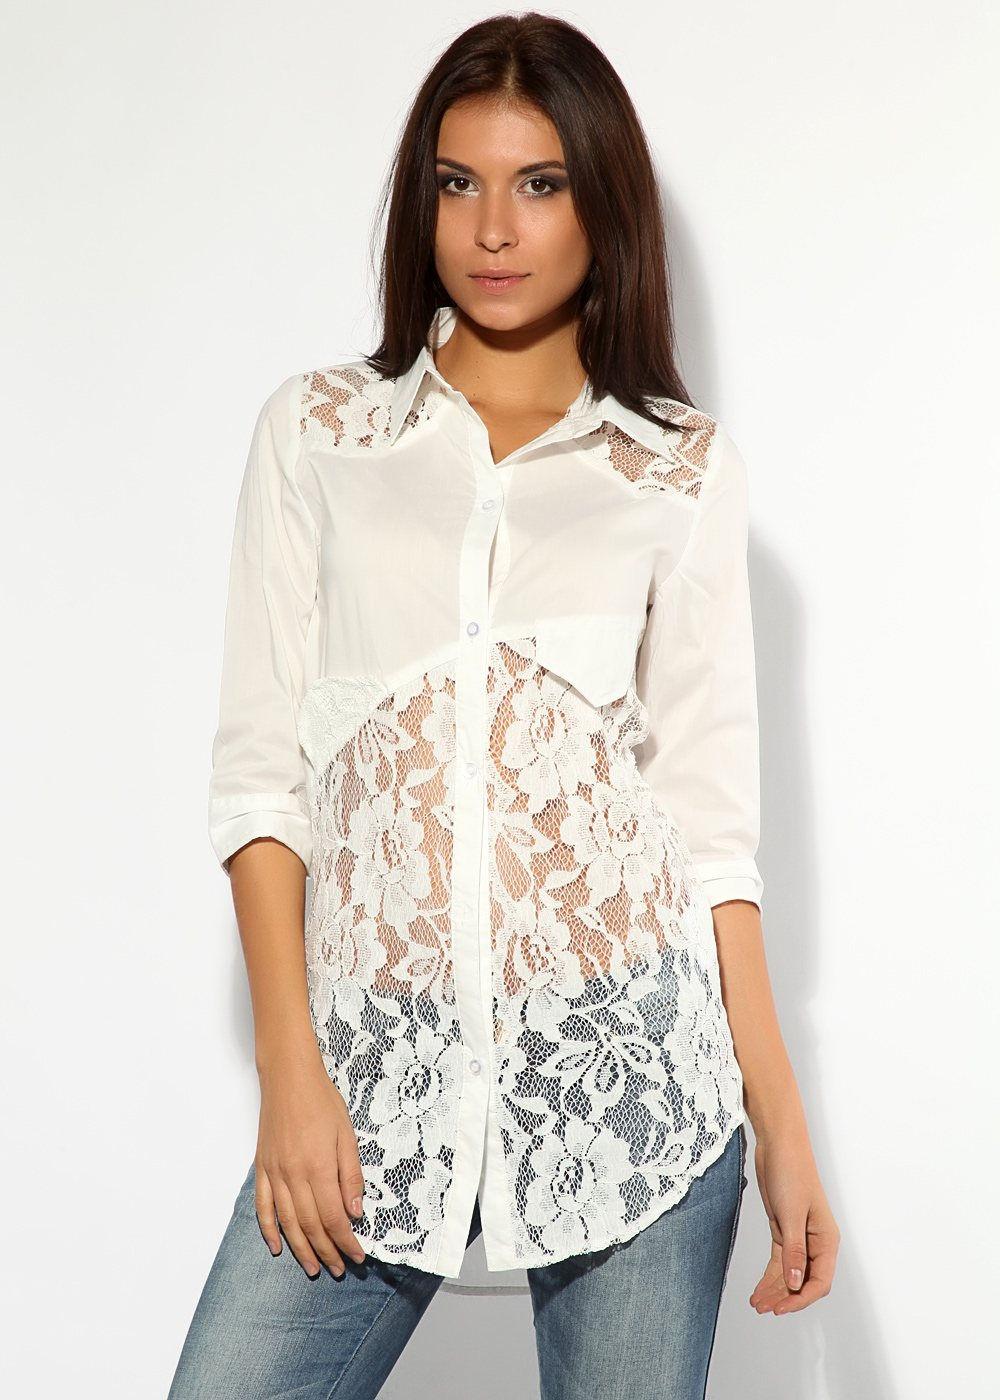 Нежные женские рубашки осень-зима 2020-2021